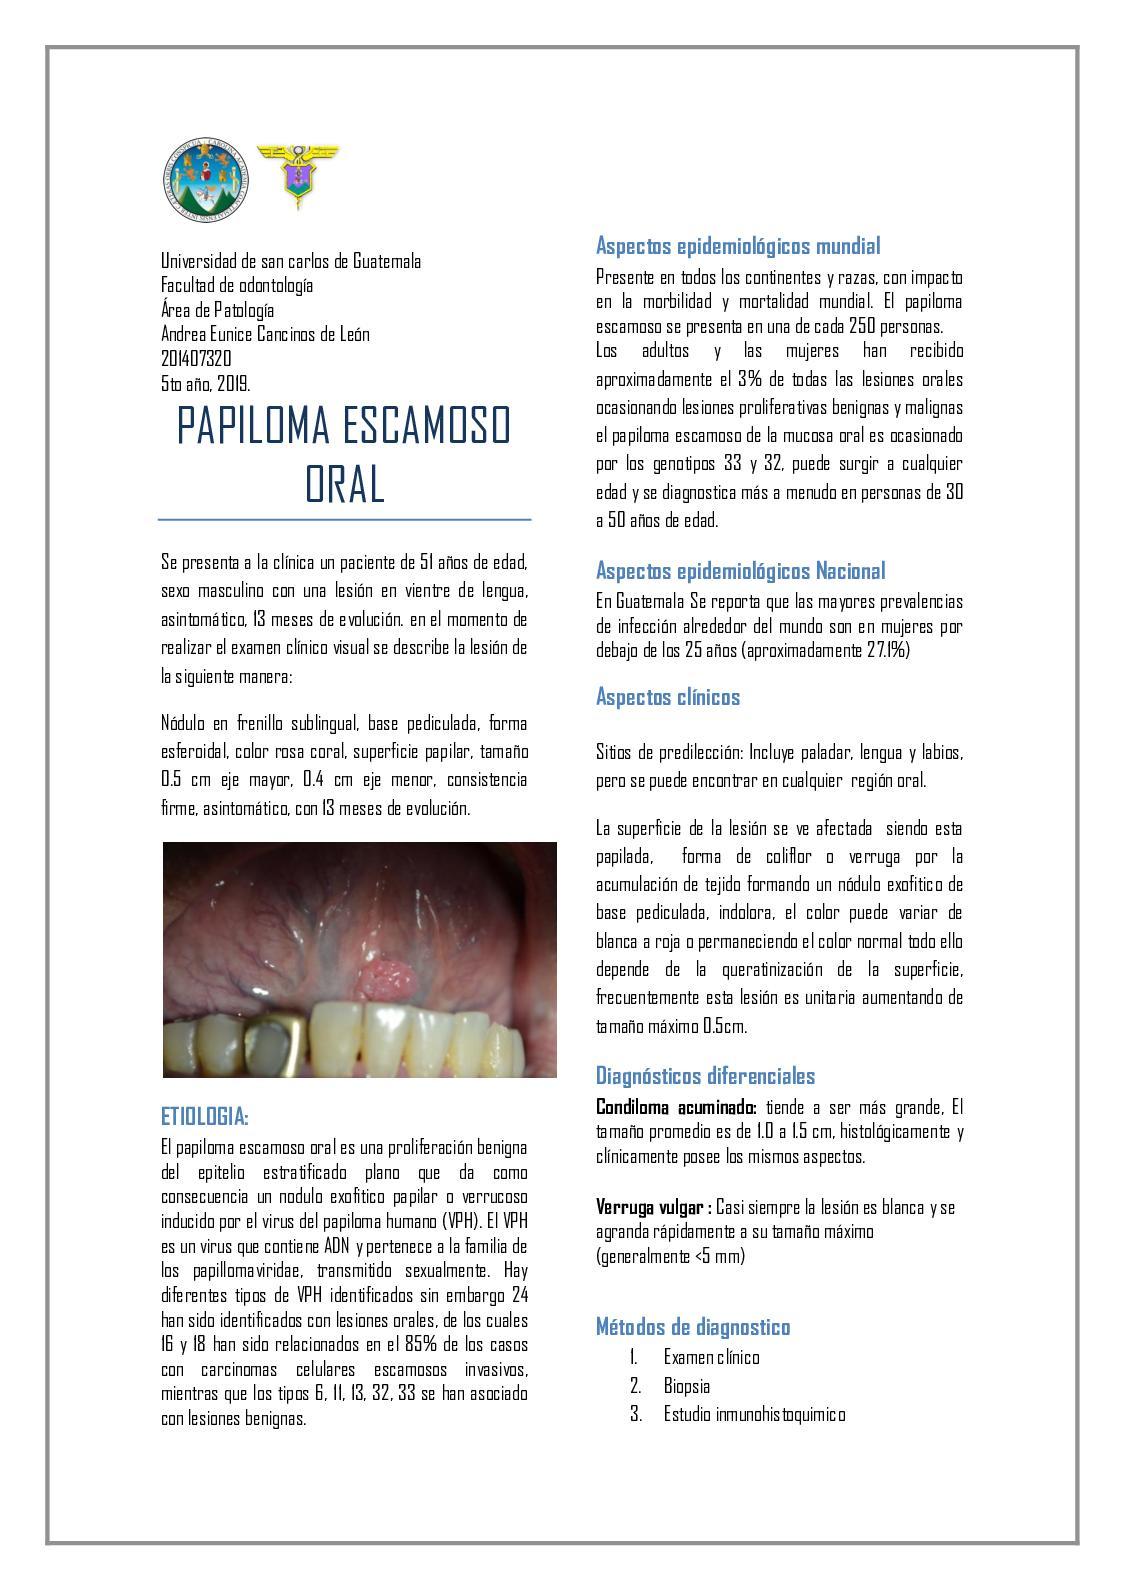 schistosomiasis of bladder cancer hormonal genetique